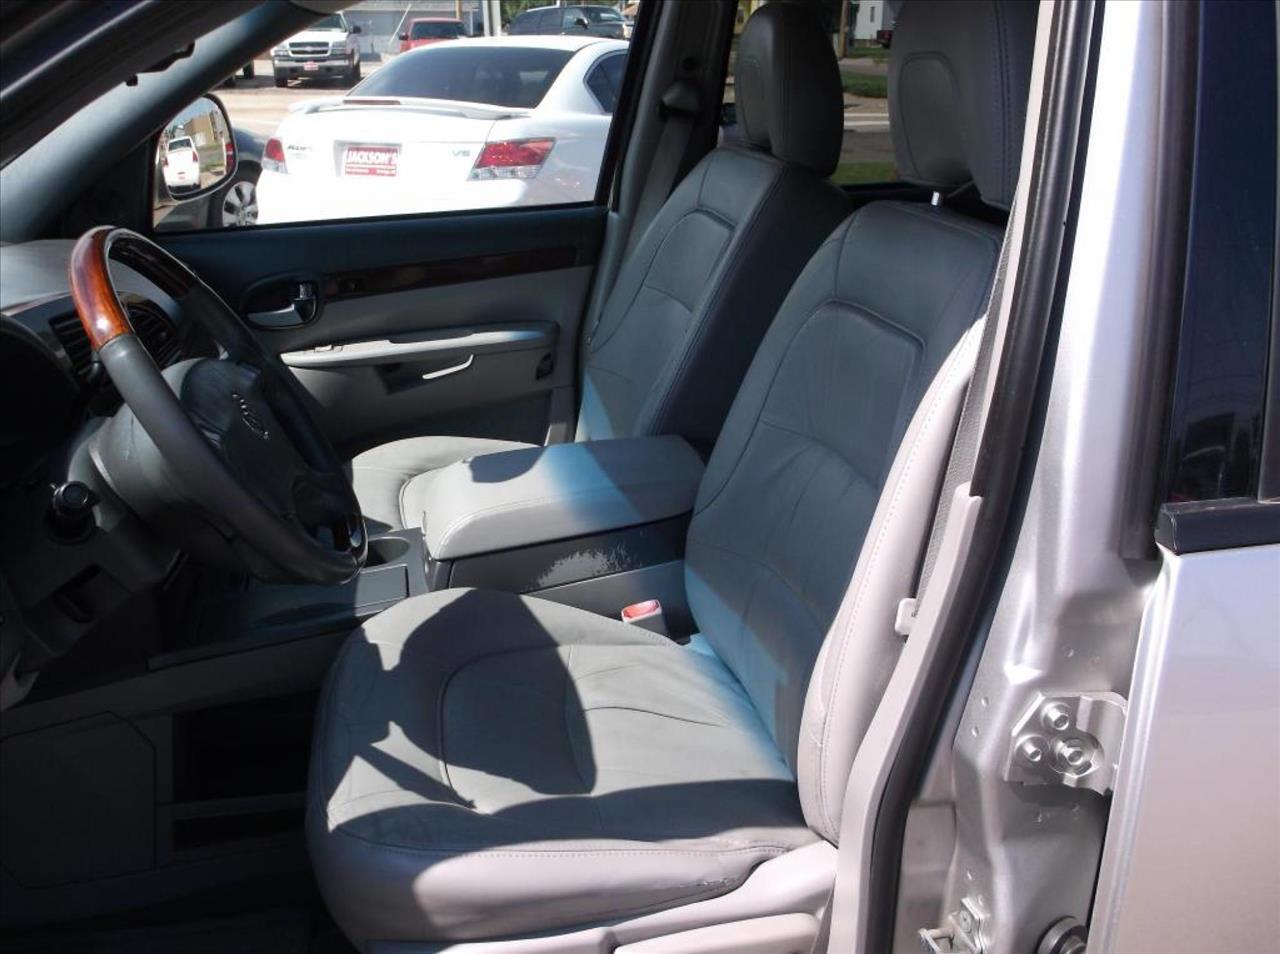 2006 Buick Rendezvous for sale at Jacksons Car Corner Inc in Hastings NE